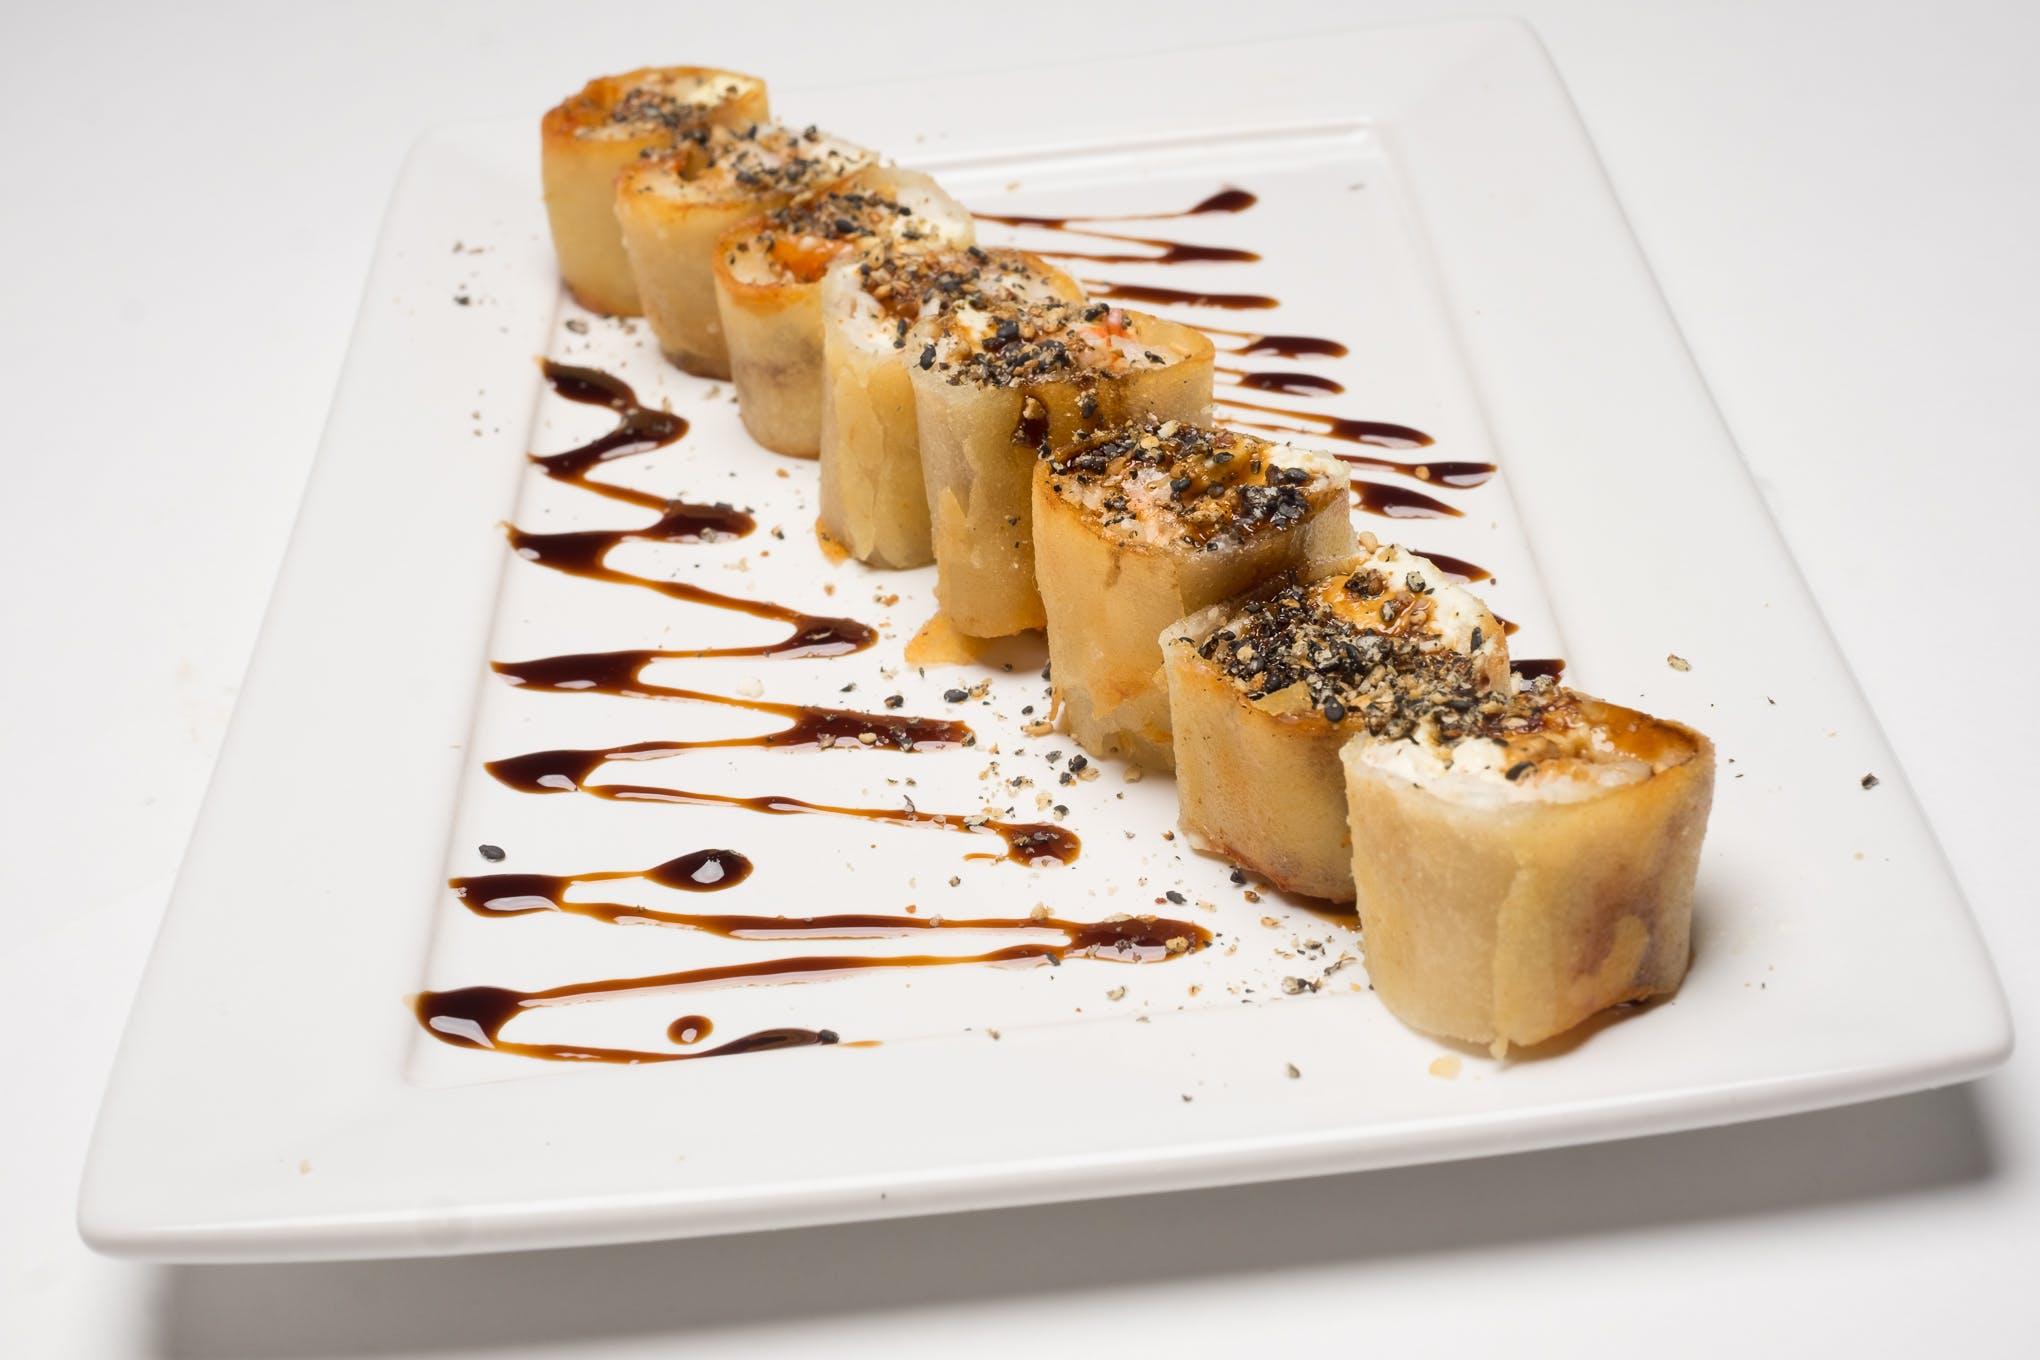 Free stock photo of food, fujifilm, food photography, chinese food